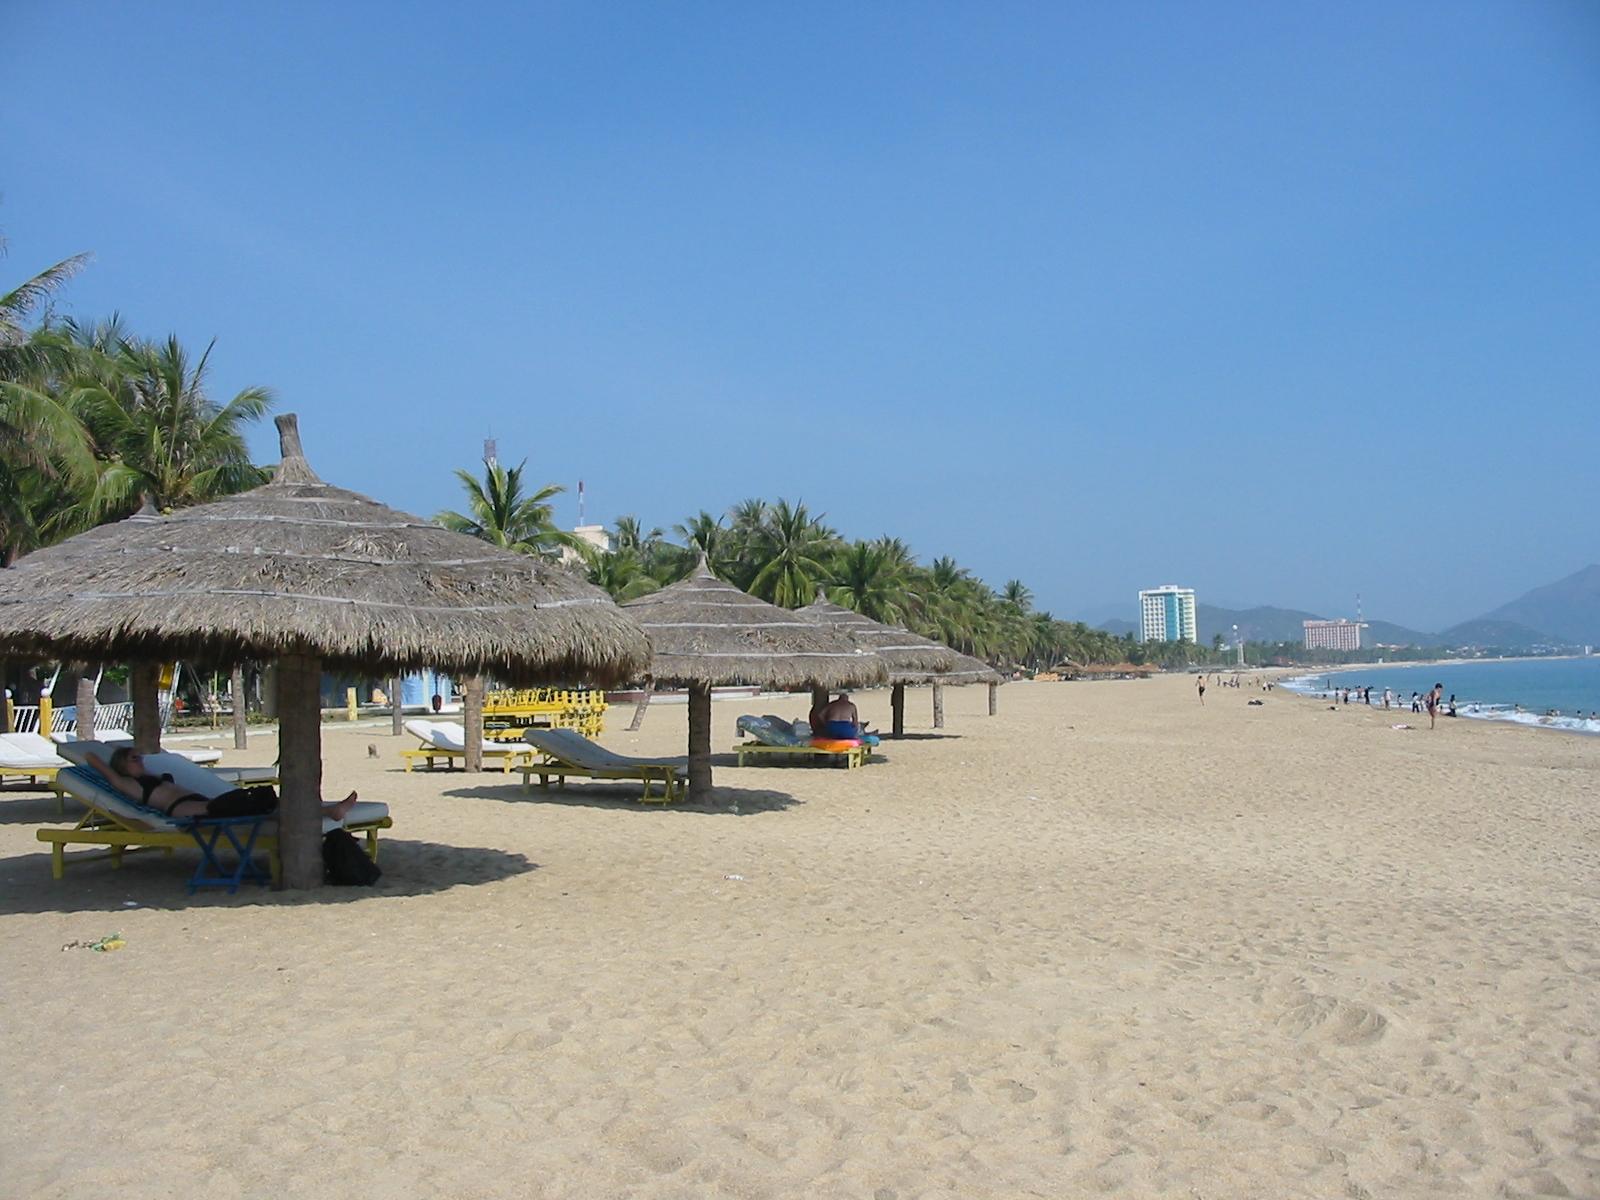 Nha Trang Vietnam  City pictures : Paradise Nha Trang tour, Nha Trang Beach Vacations, Vietnam Hoidays